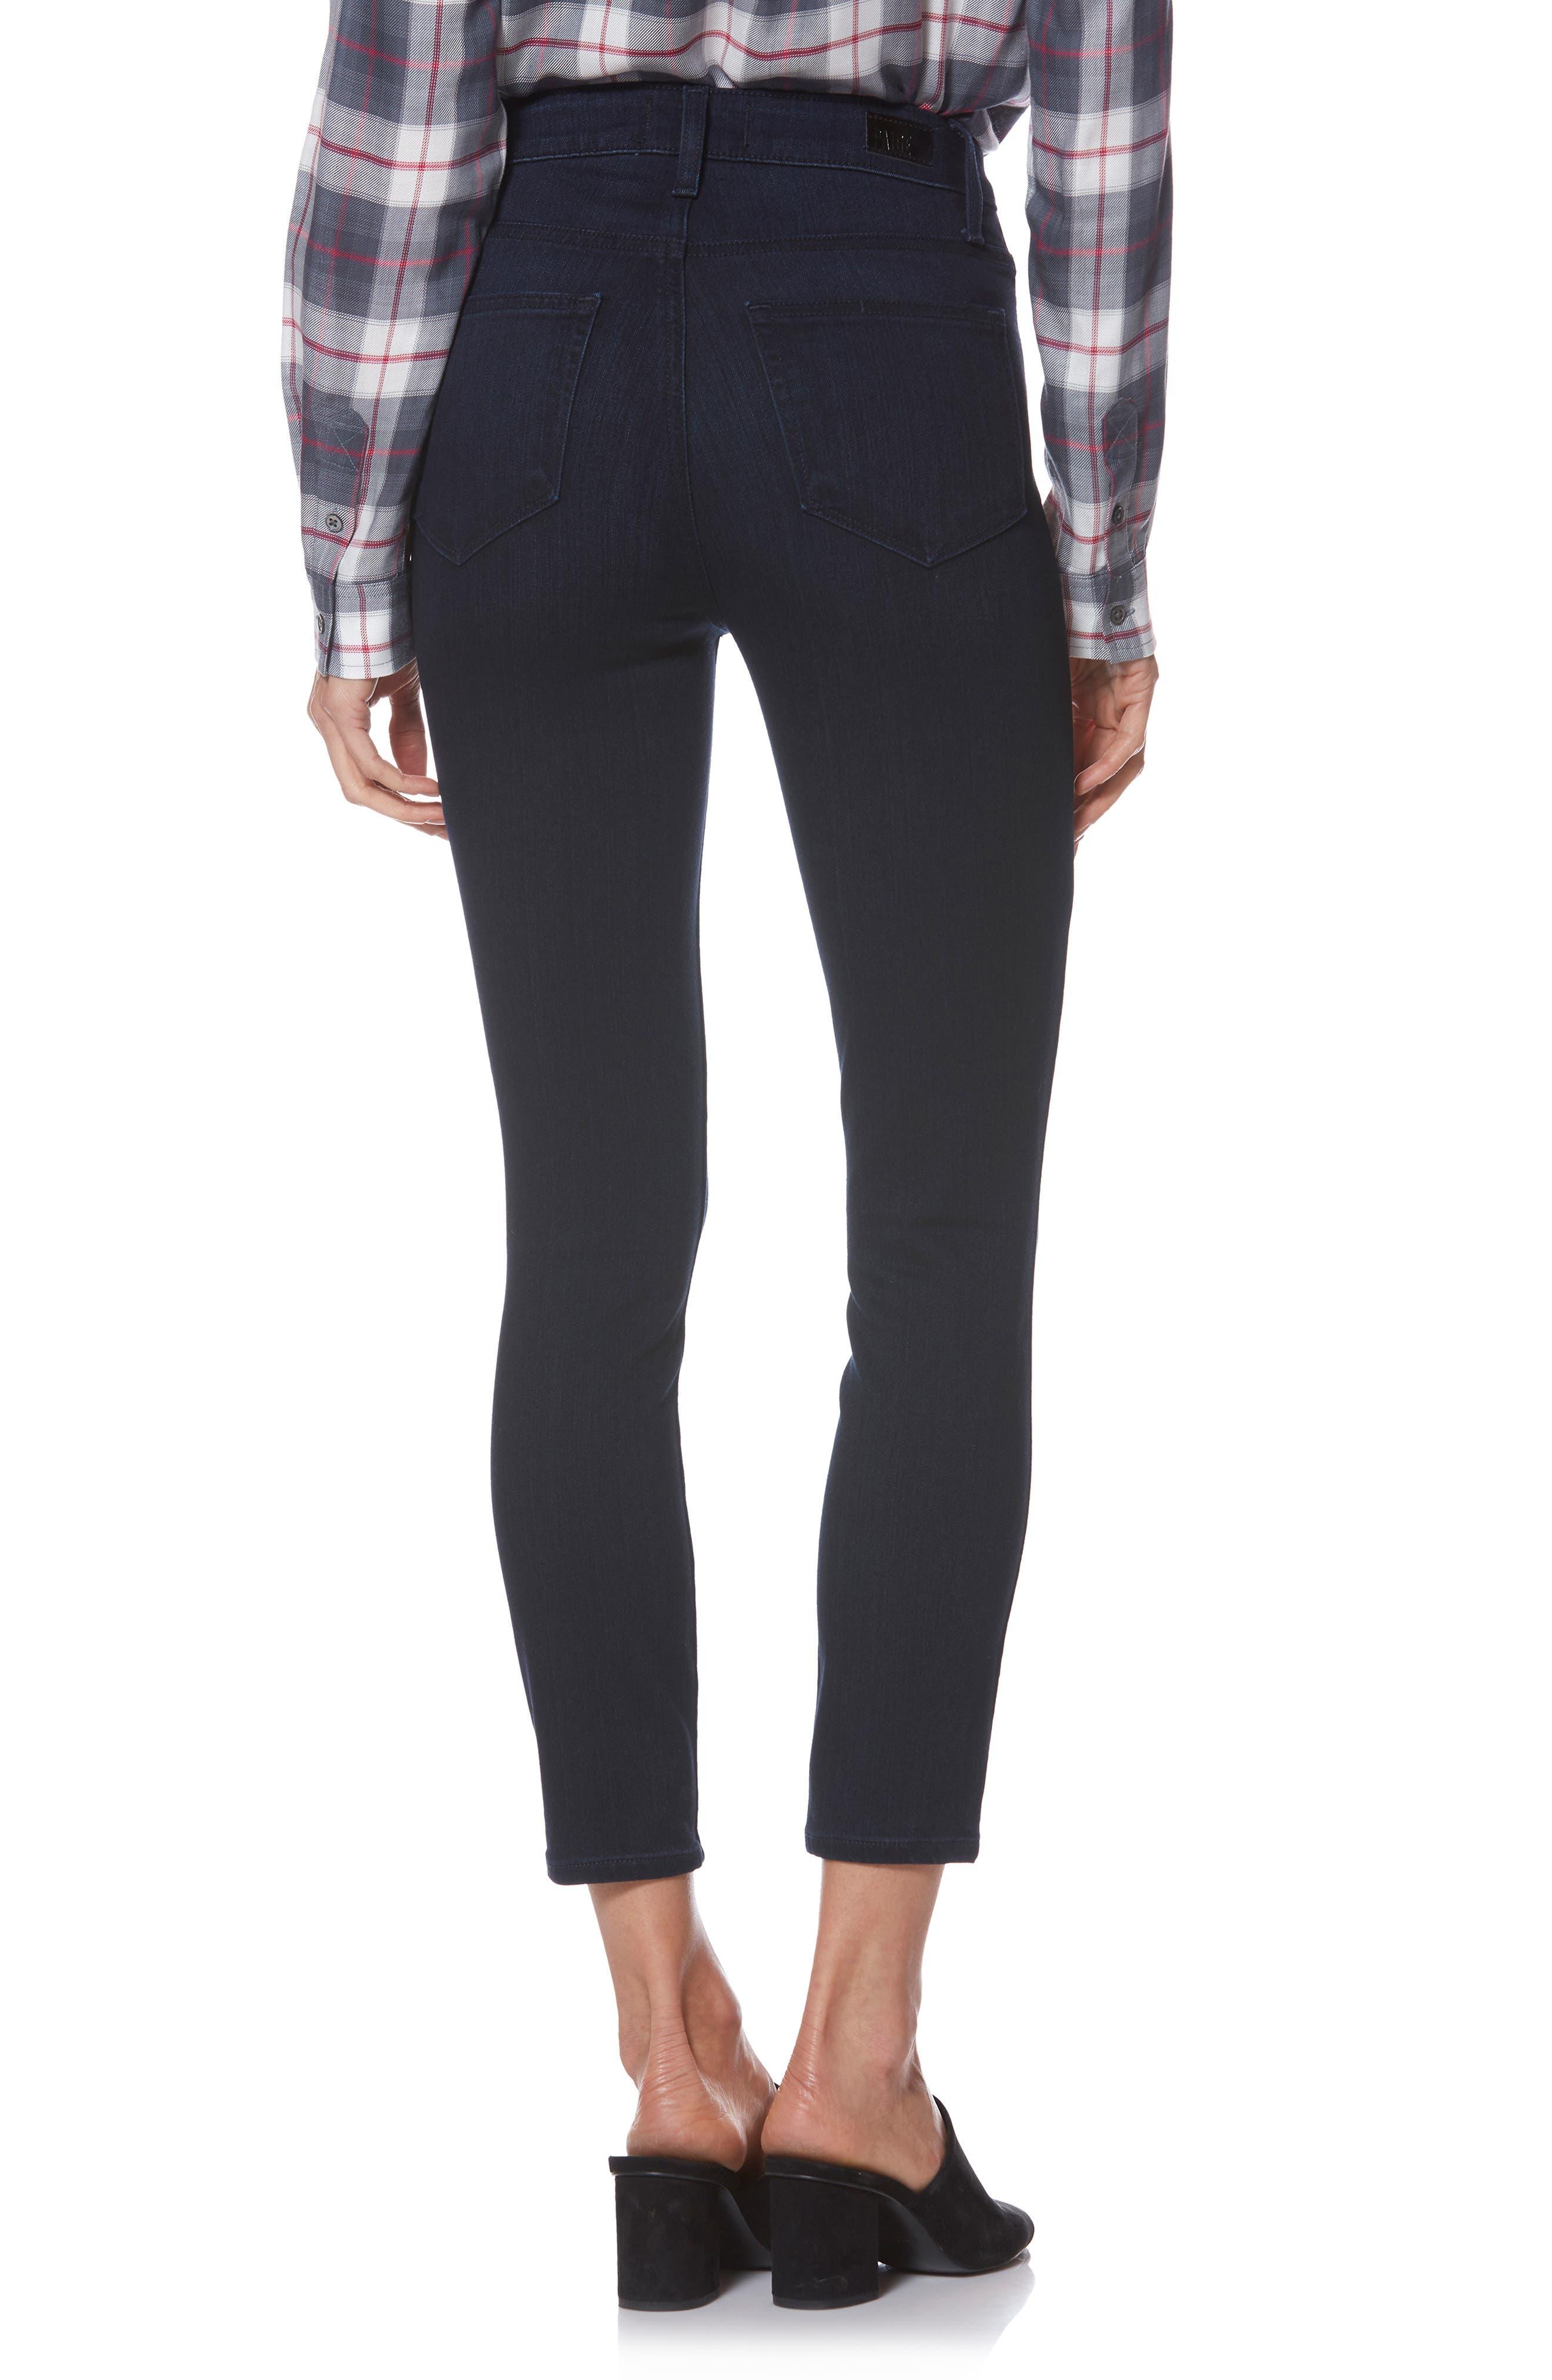 Transcend - Margot High Waist Crop Skinny Jeans,                             Alternate thumbnail 2, color,                             LANA